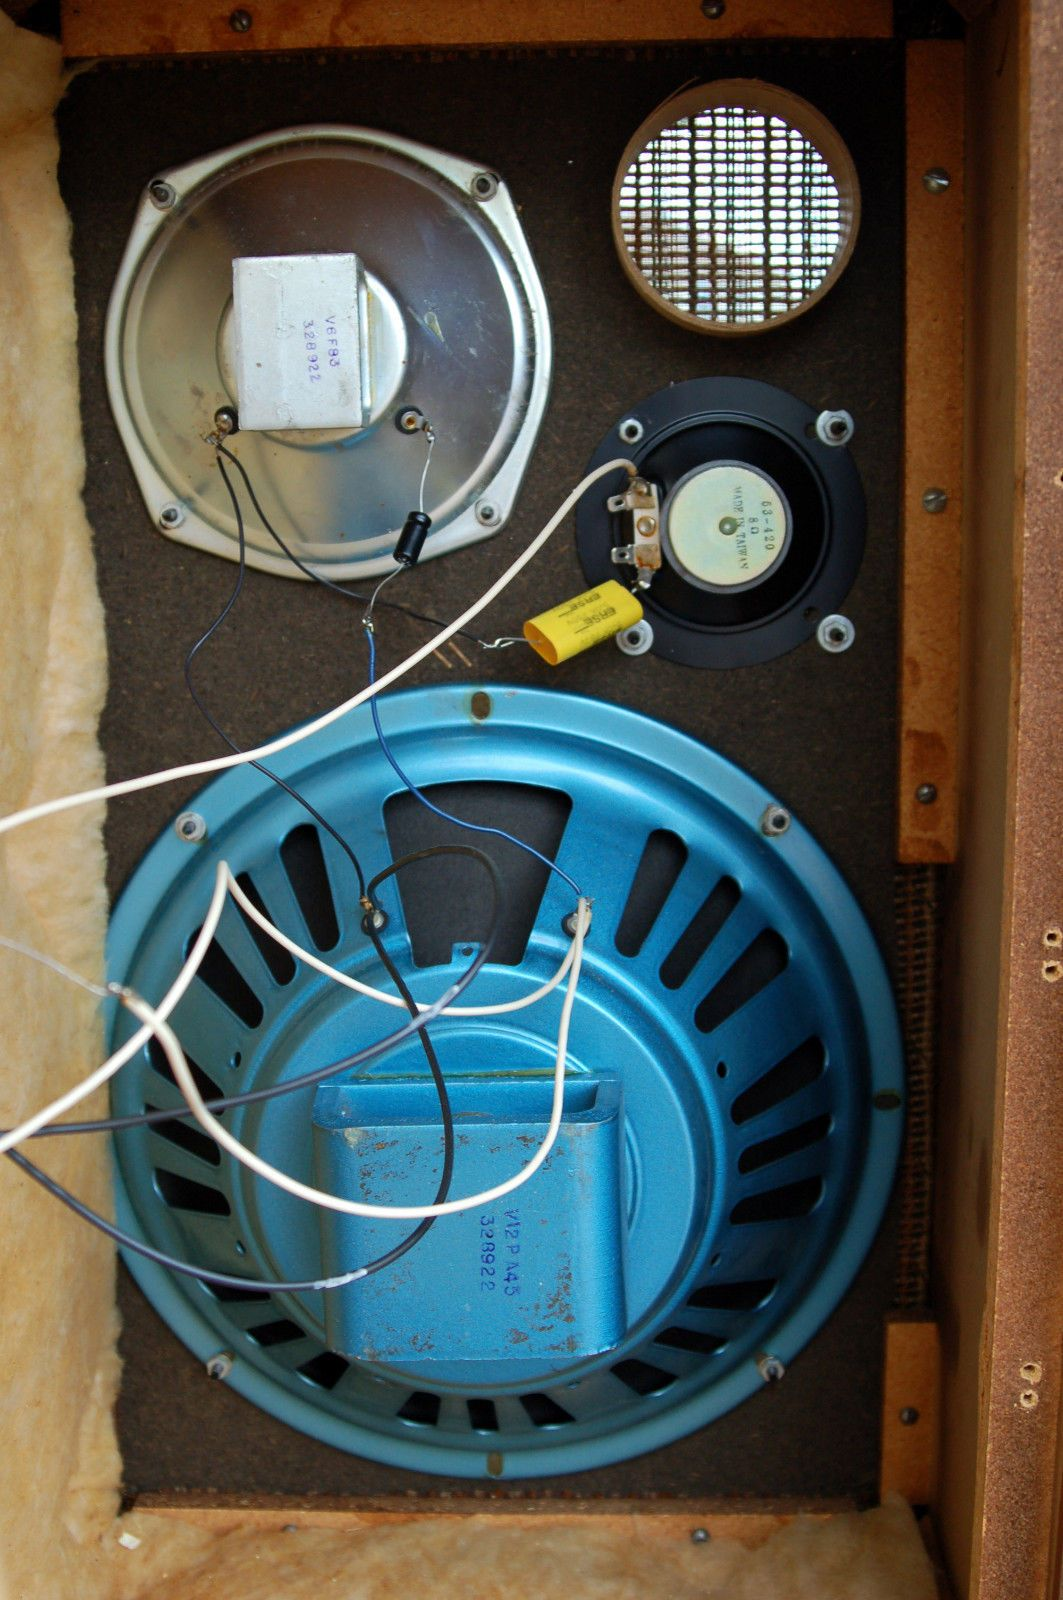 hight resolution of vintage utah wd 66 12 3 way speaker system 8 ohms 30 watts made in usa ebay